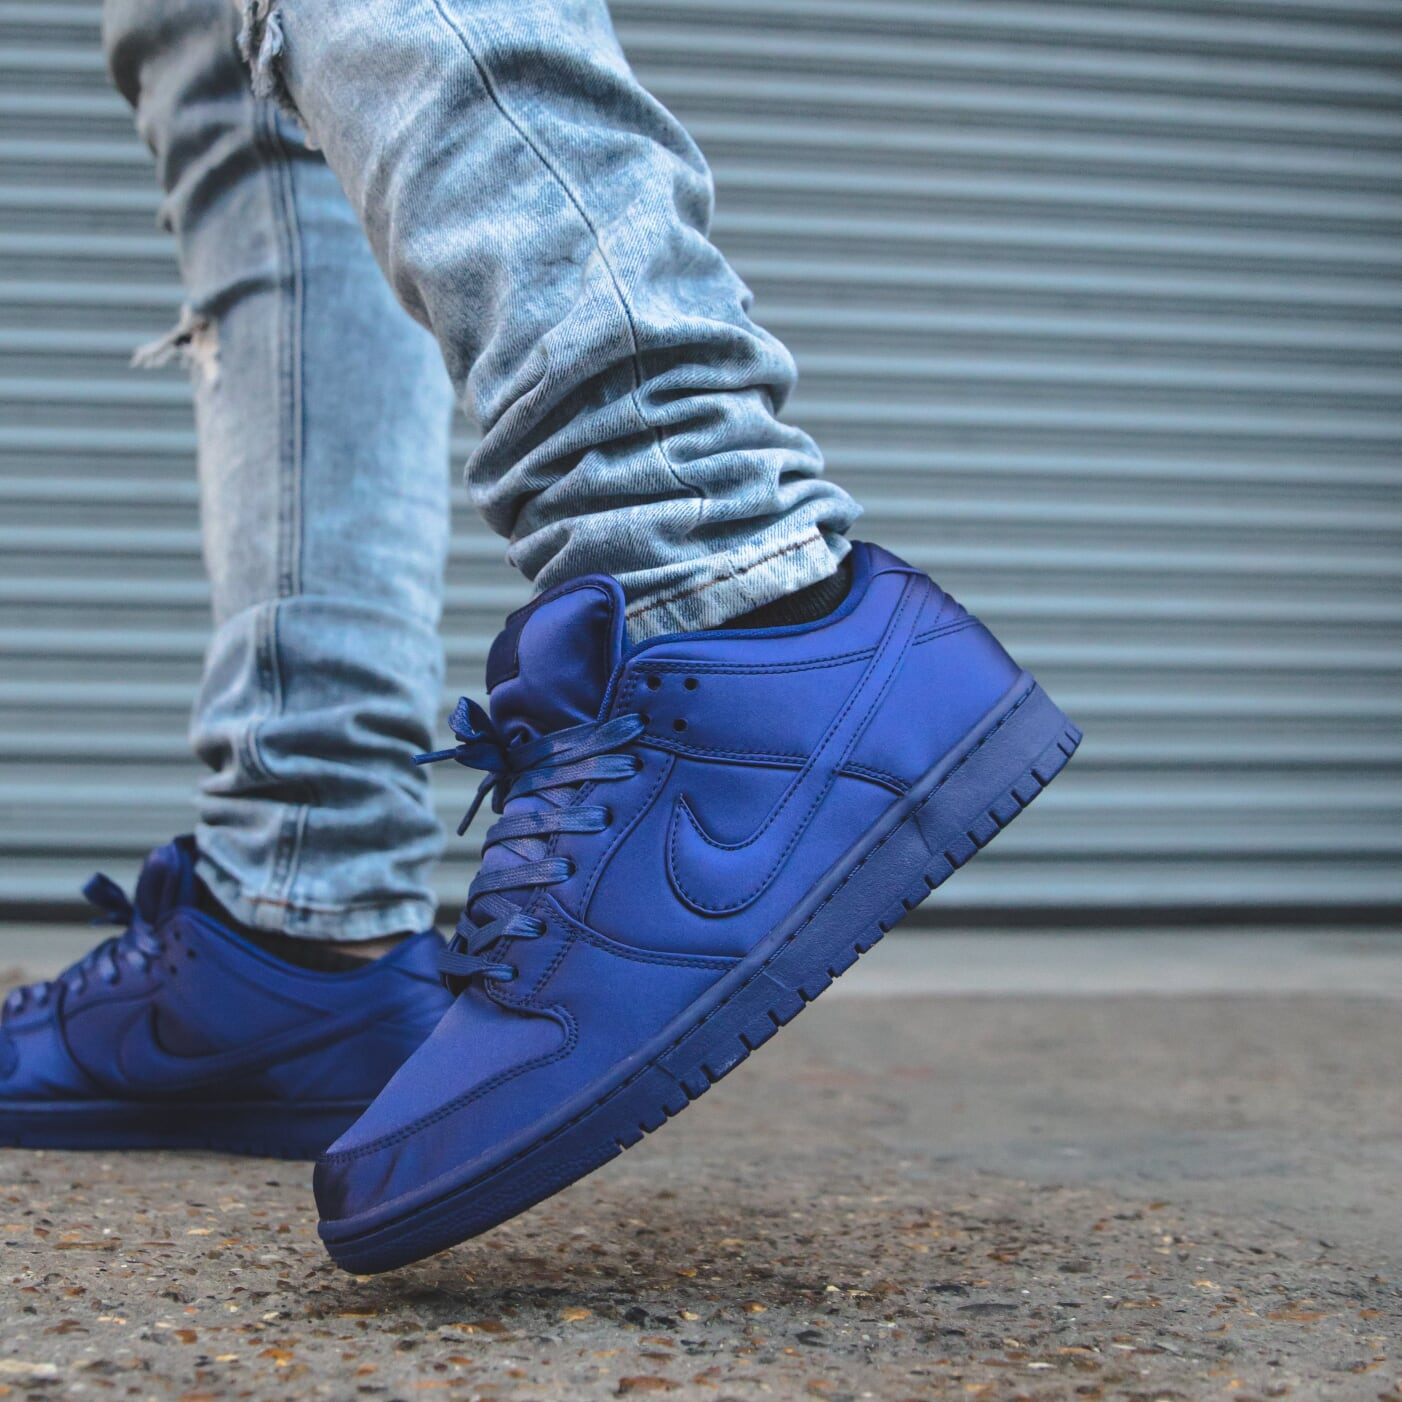 MYTHFOCUS: NBA x Nike SB Dunk Low 'Deep Royal Blue' - Sneaker Myth